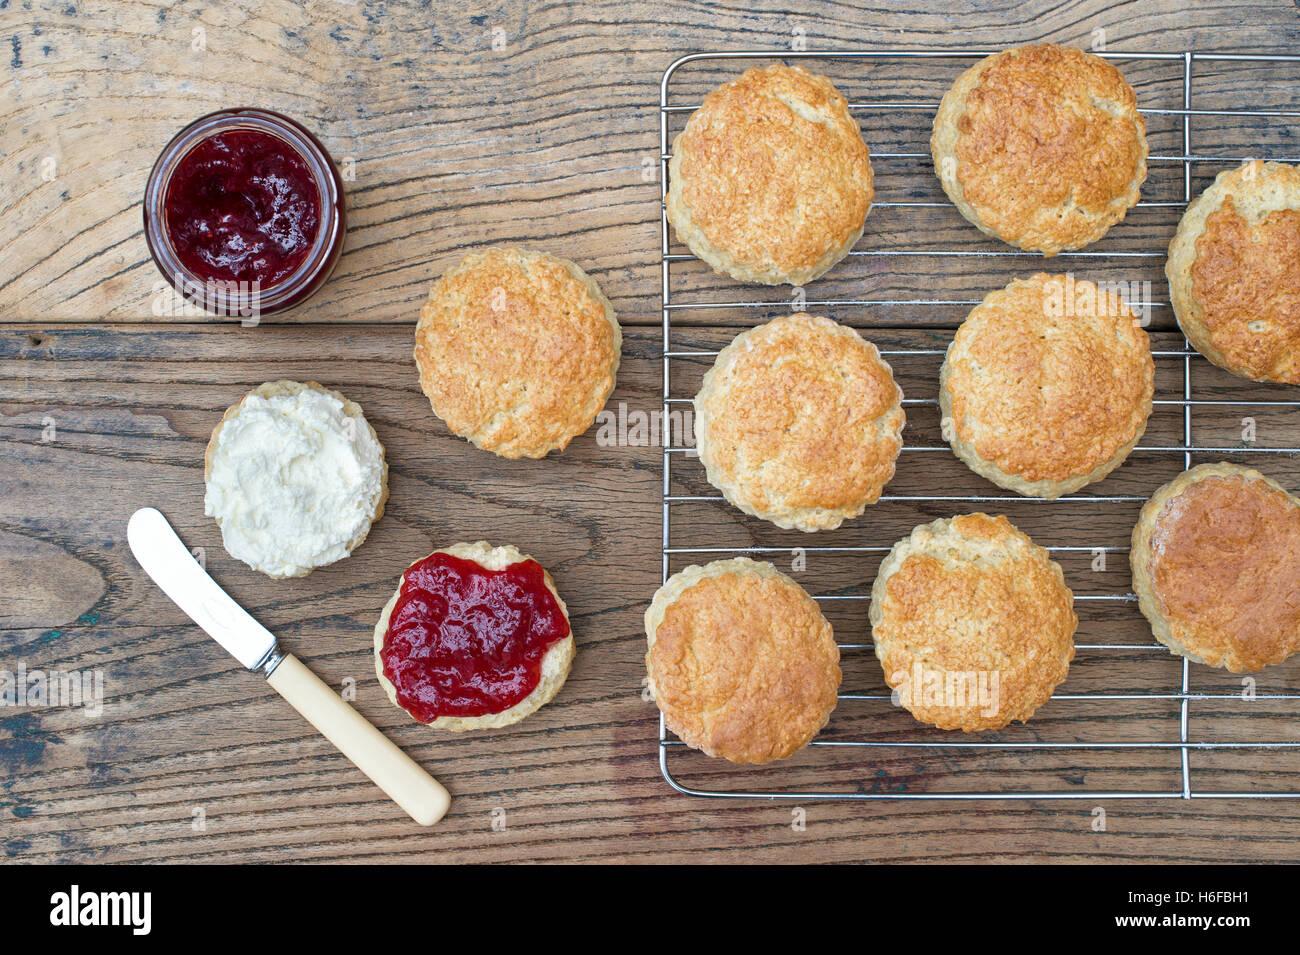 Devonshire Scones with Jam and Cream - Stock Image